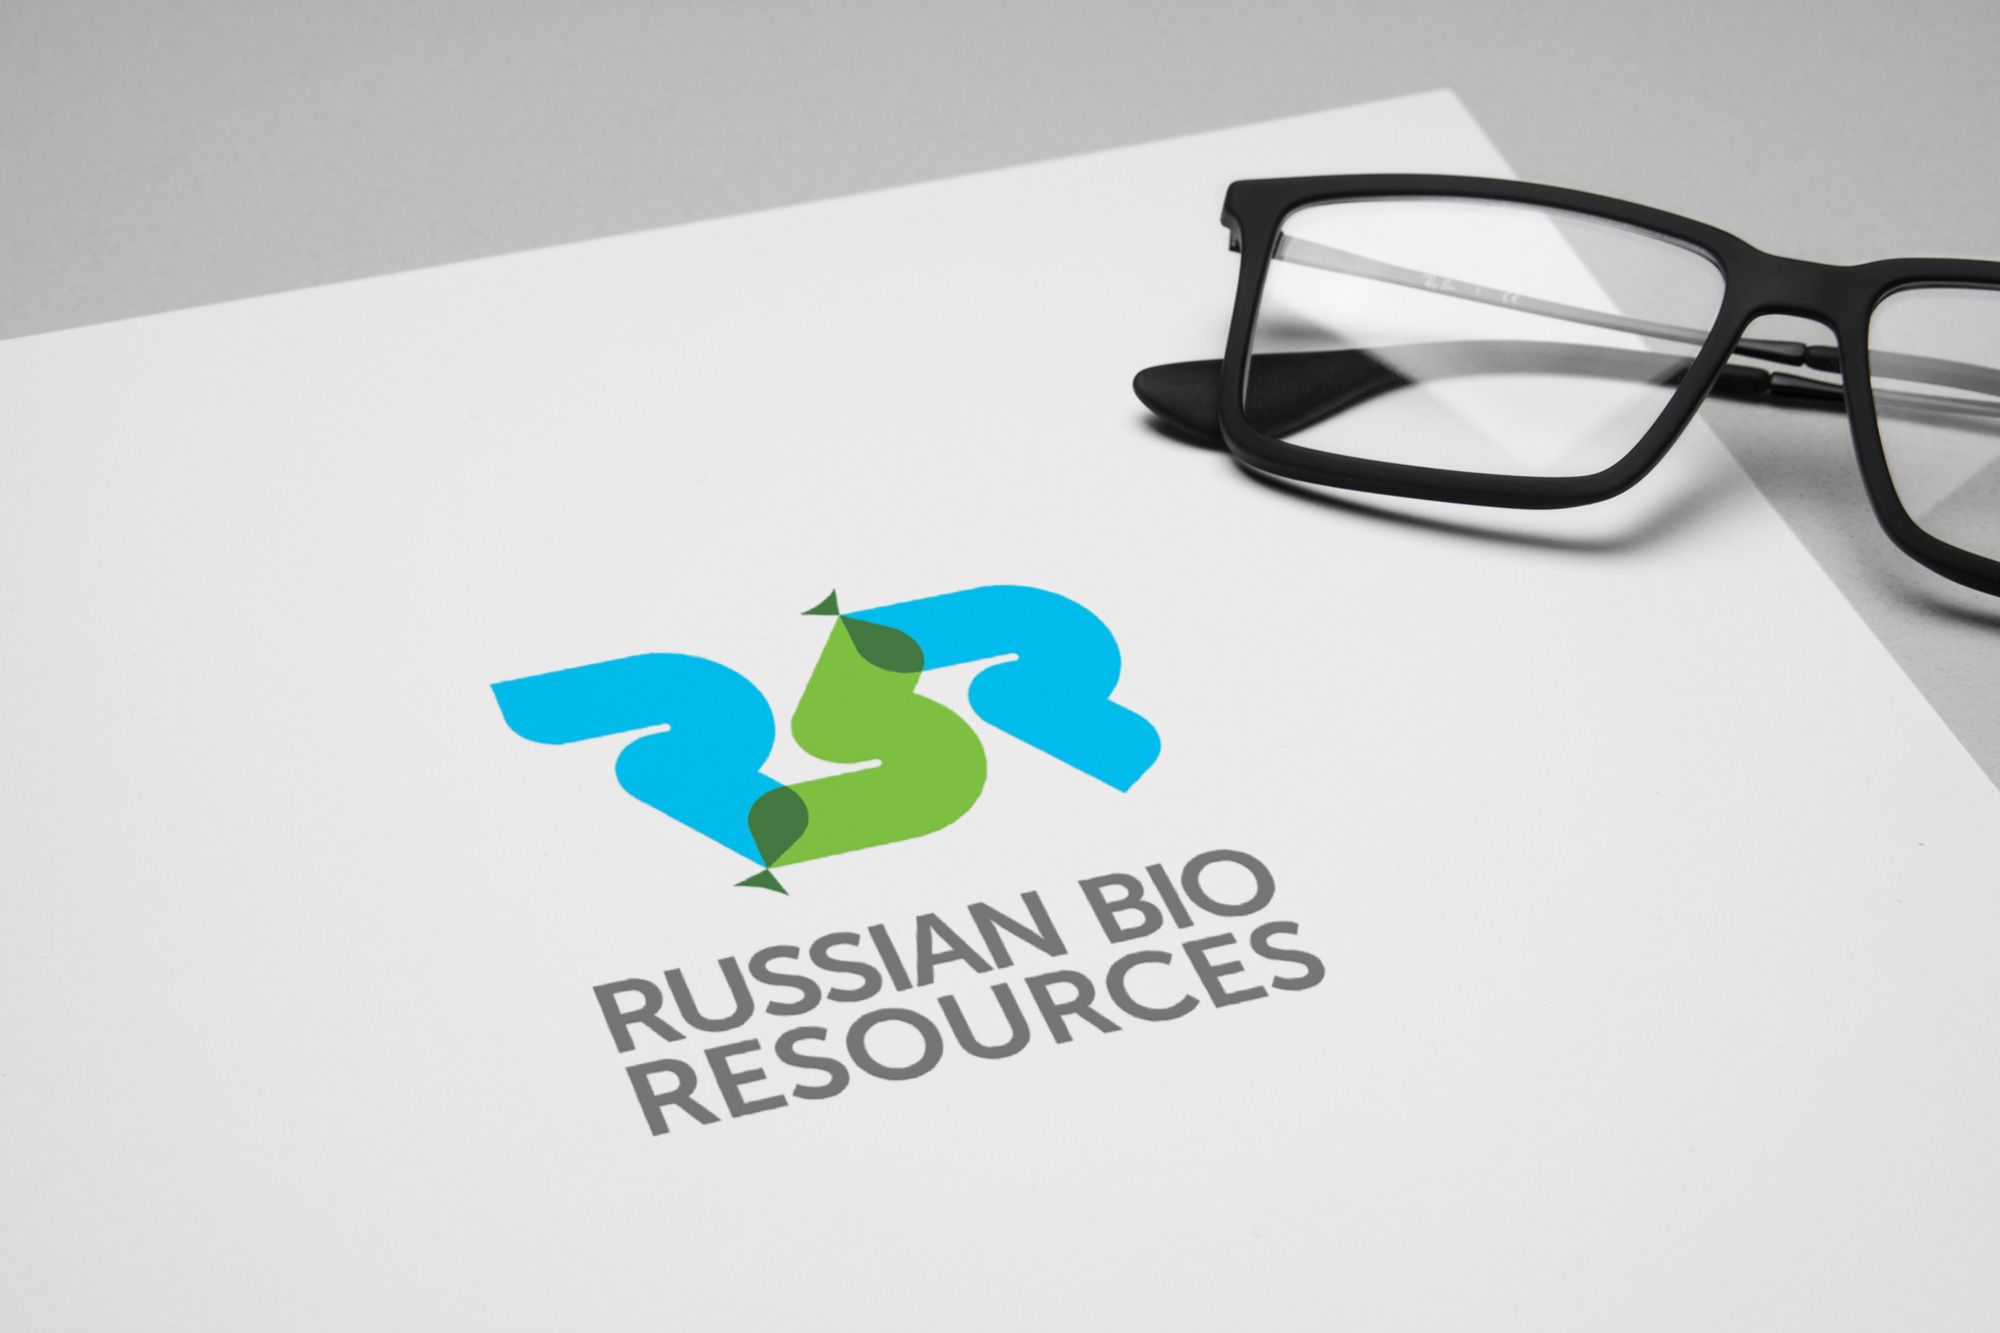 Разработка логотипа для компании «Русские Био Ресурсы» фото f_77558f8a540c9a0e.jpg